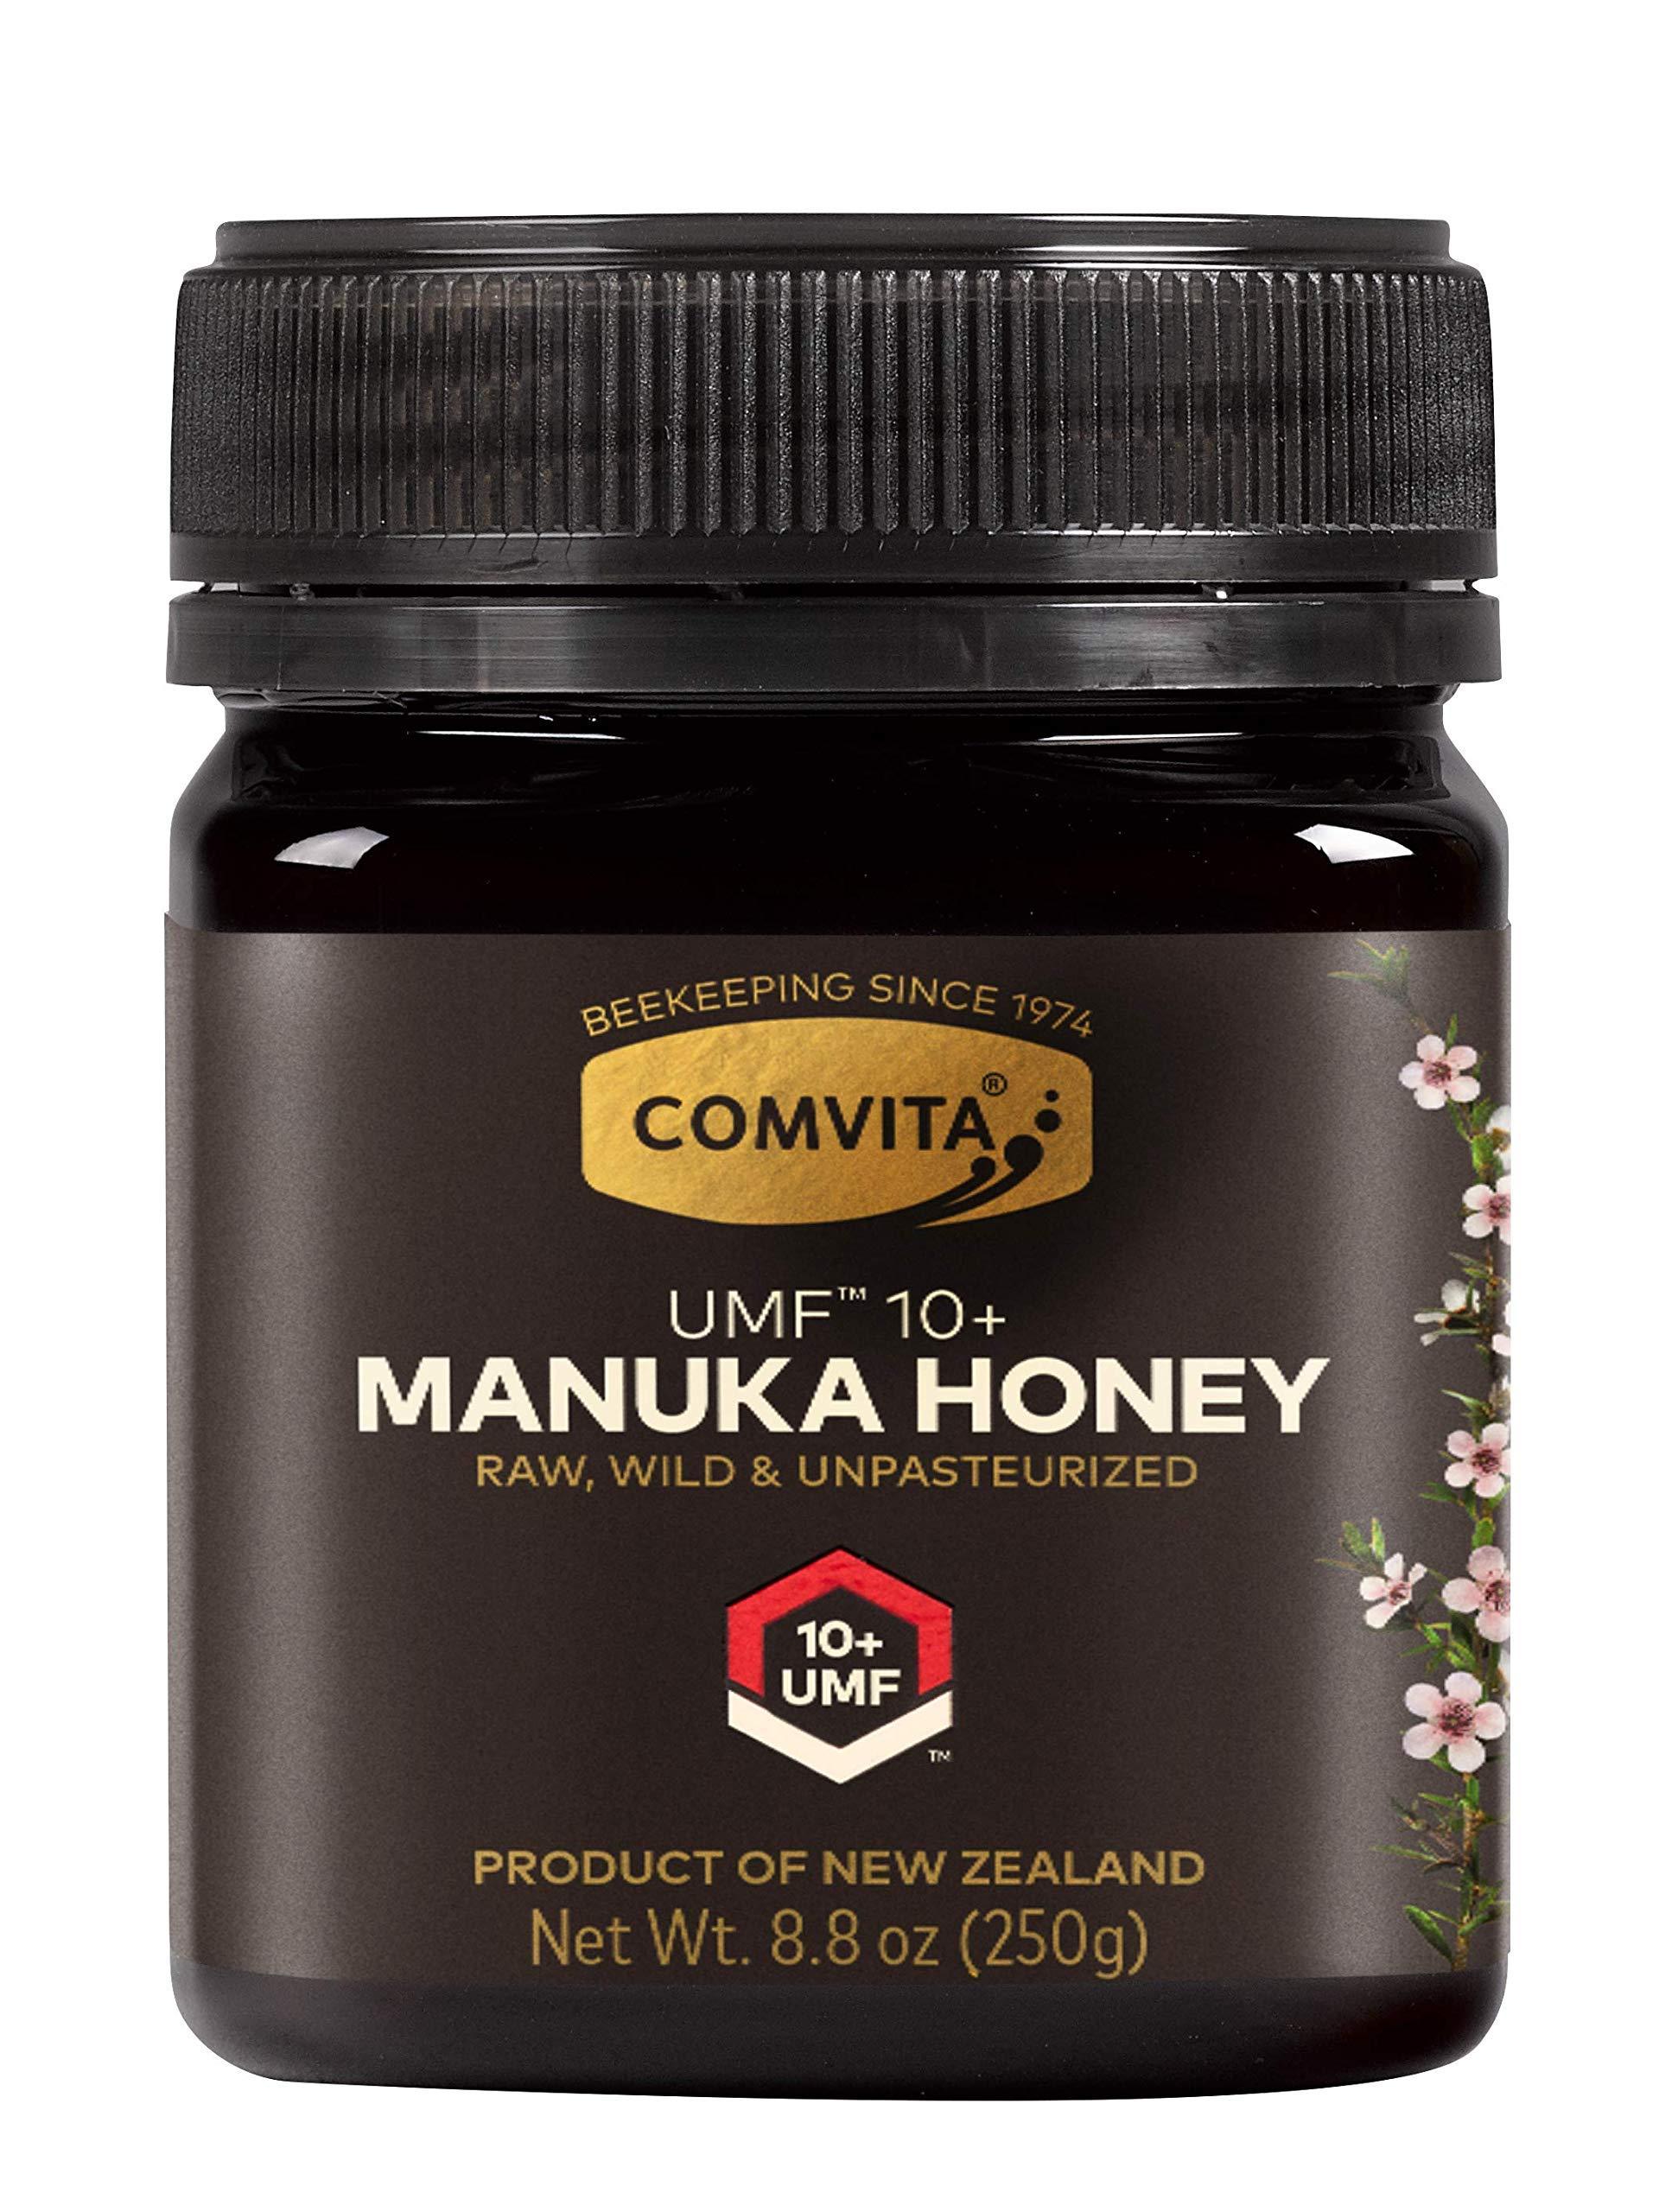 Comvita UMF 10+ (MGO 263+) Raw Manuka Honey | 8.8 oz I New Zealand's #1 Manuka Brand | Wild, Non-GMO I Premium Grade by Comvita (Image #2)